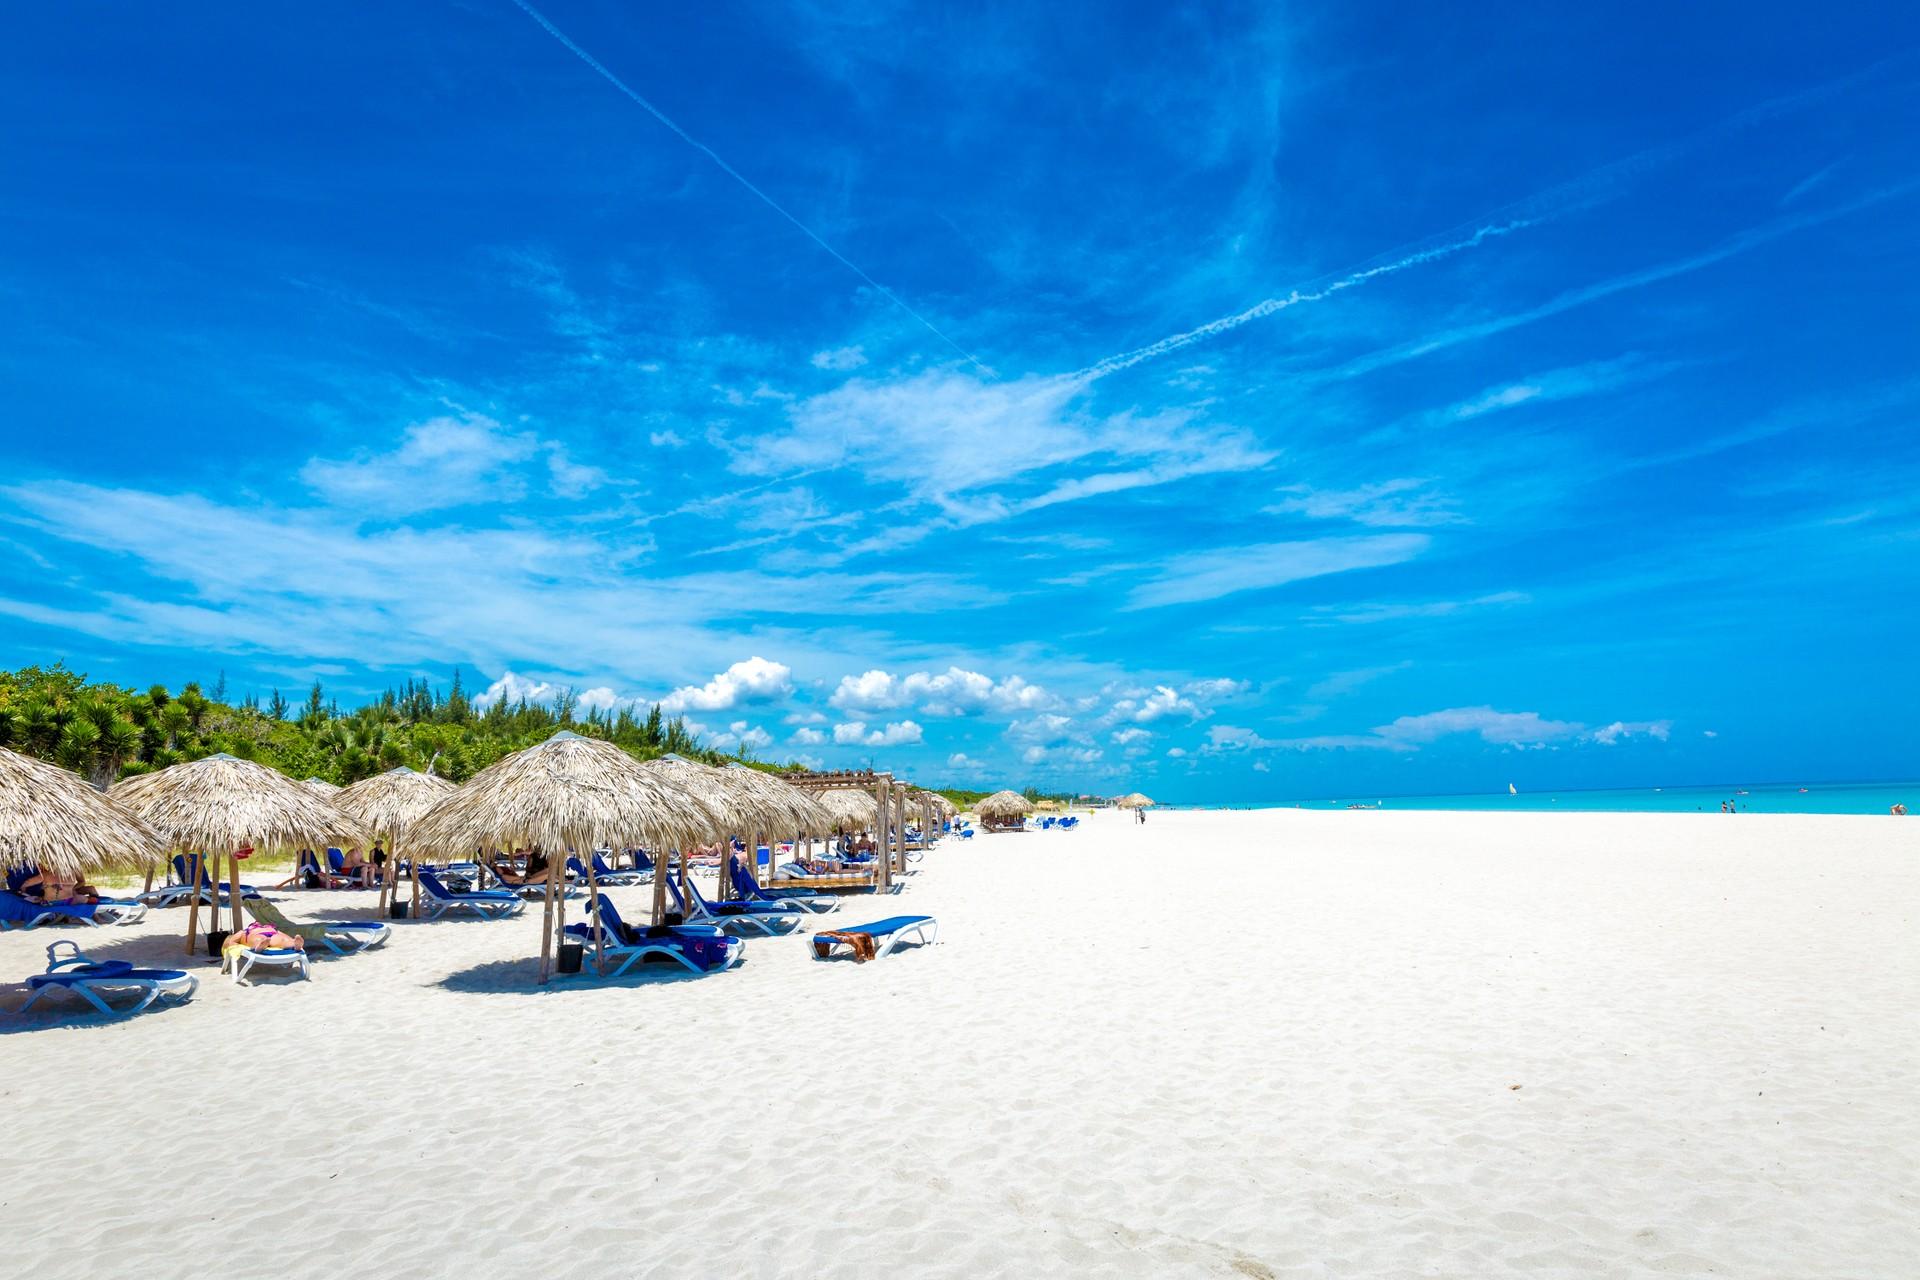 Varadero beach is one of Cuba's best family friendly resorts